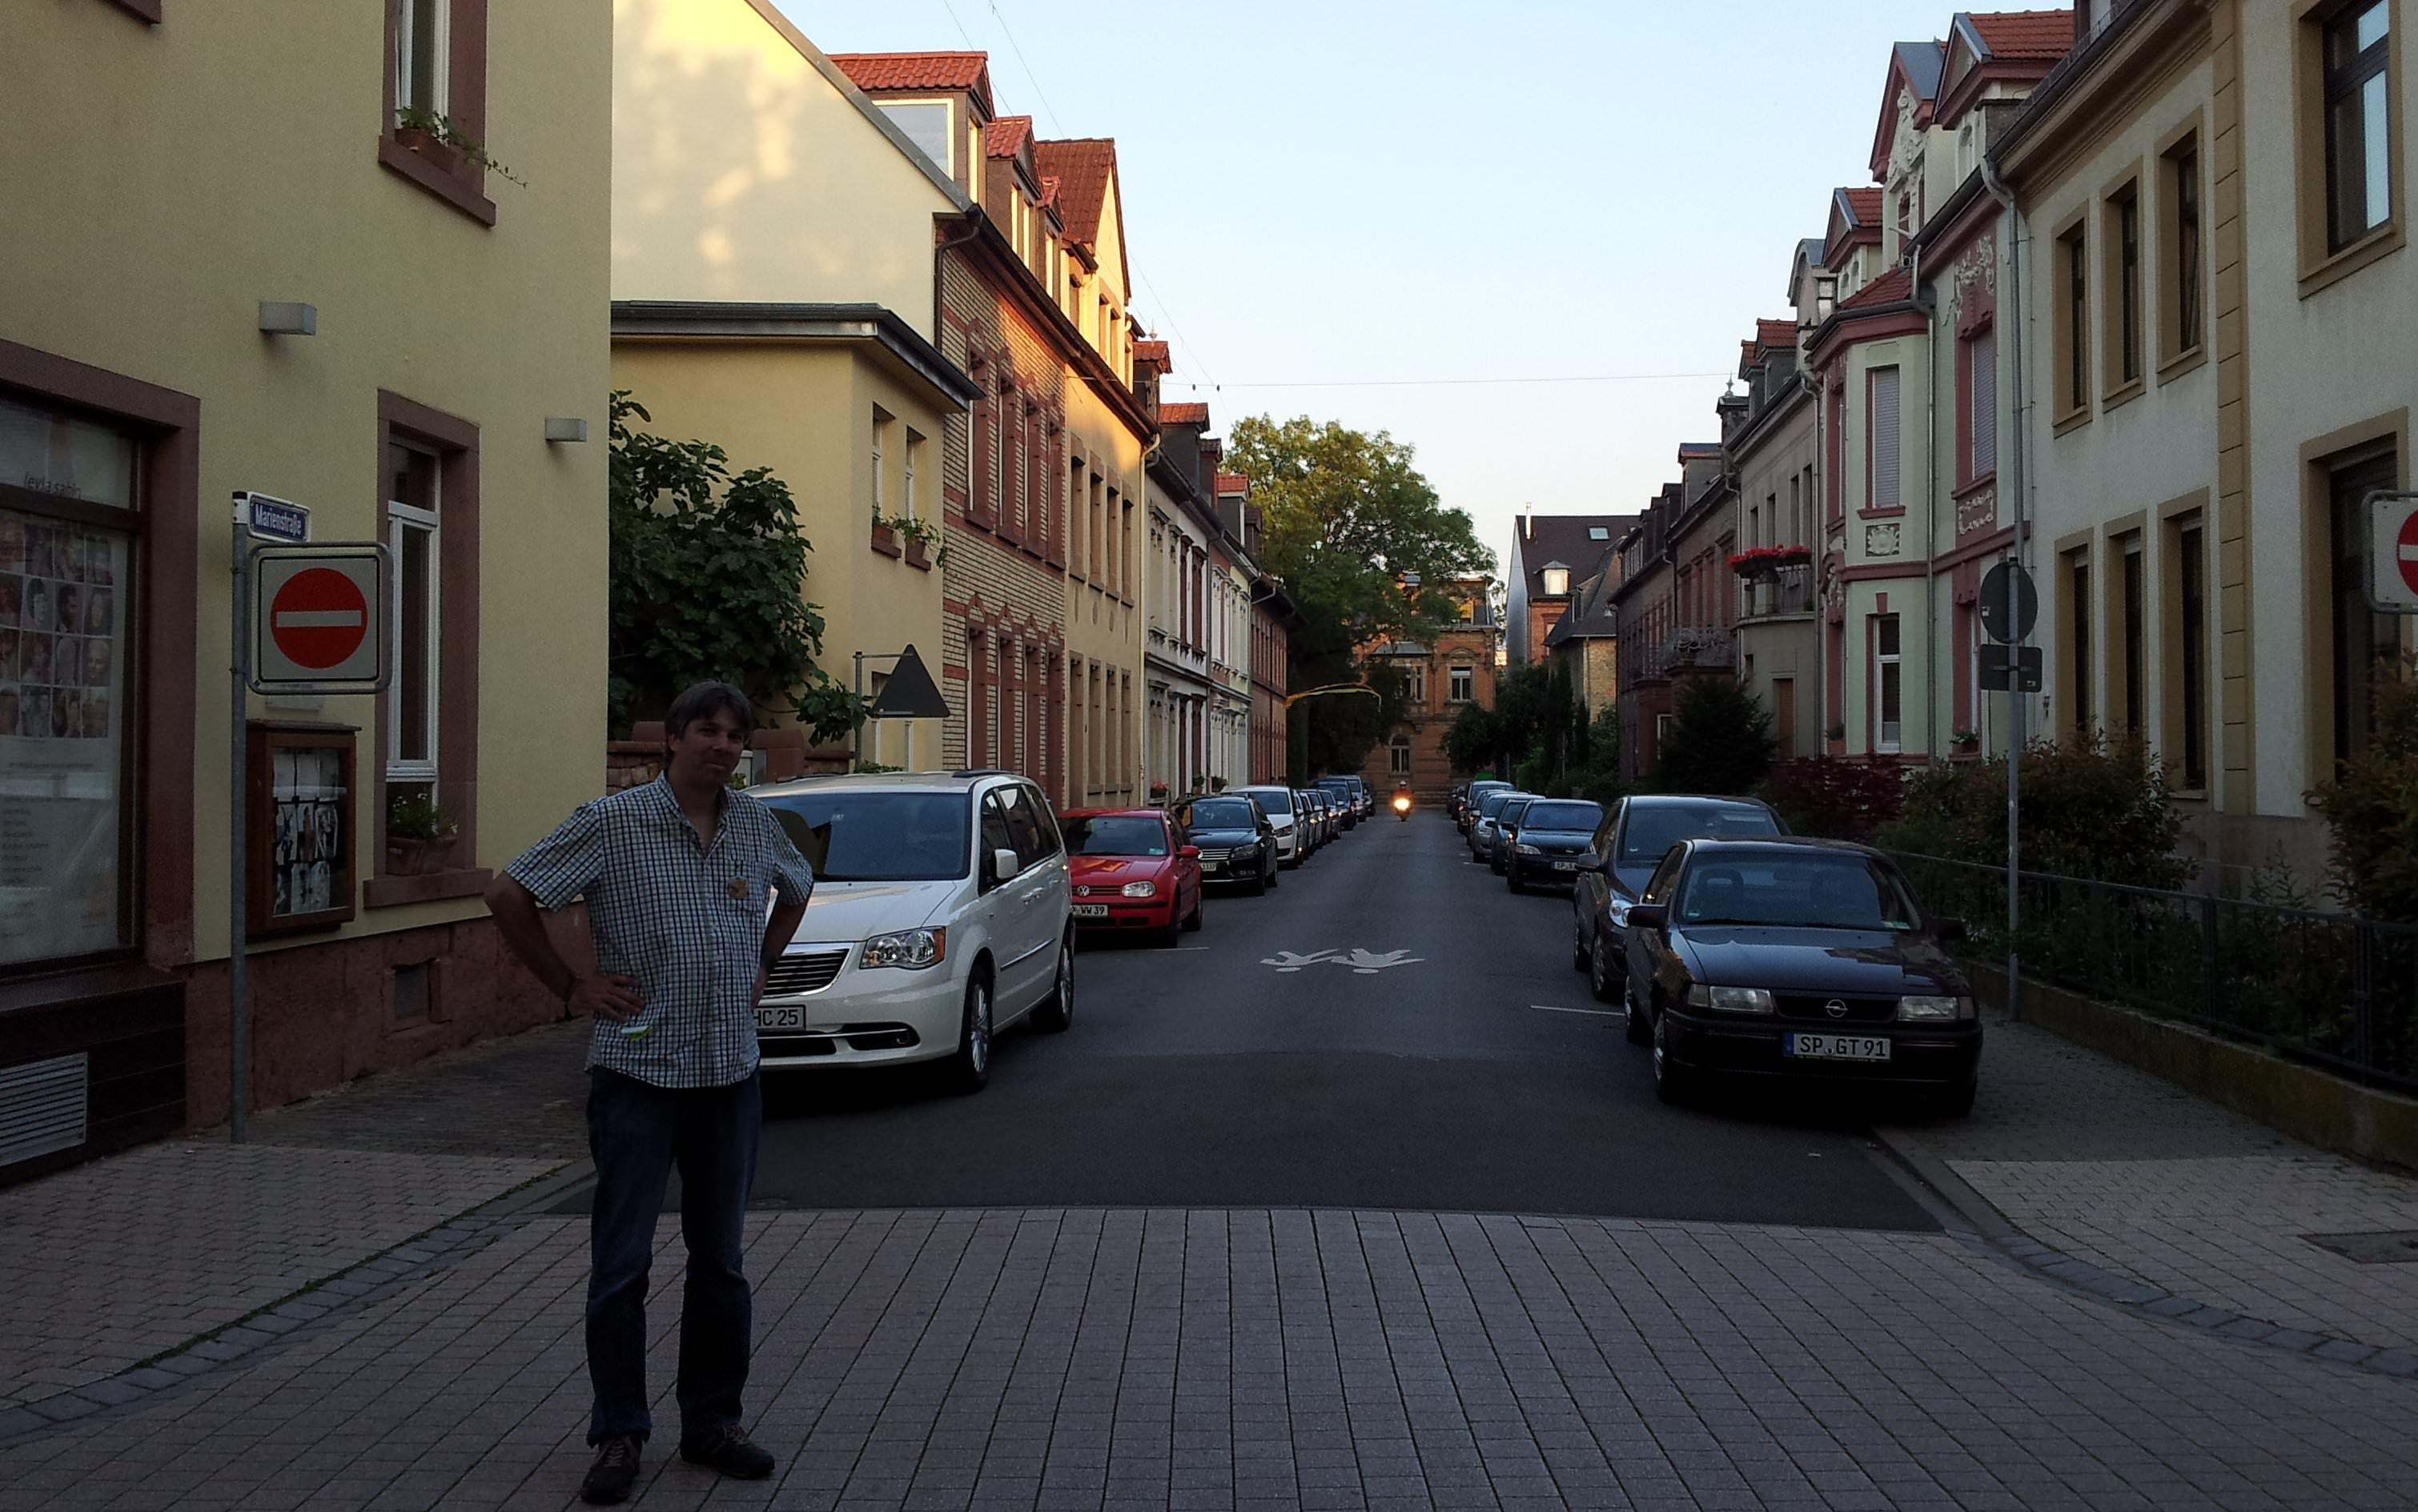 Marienstraße in Speyer